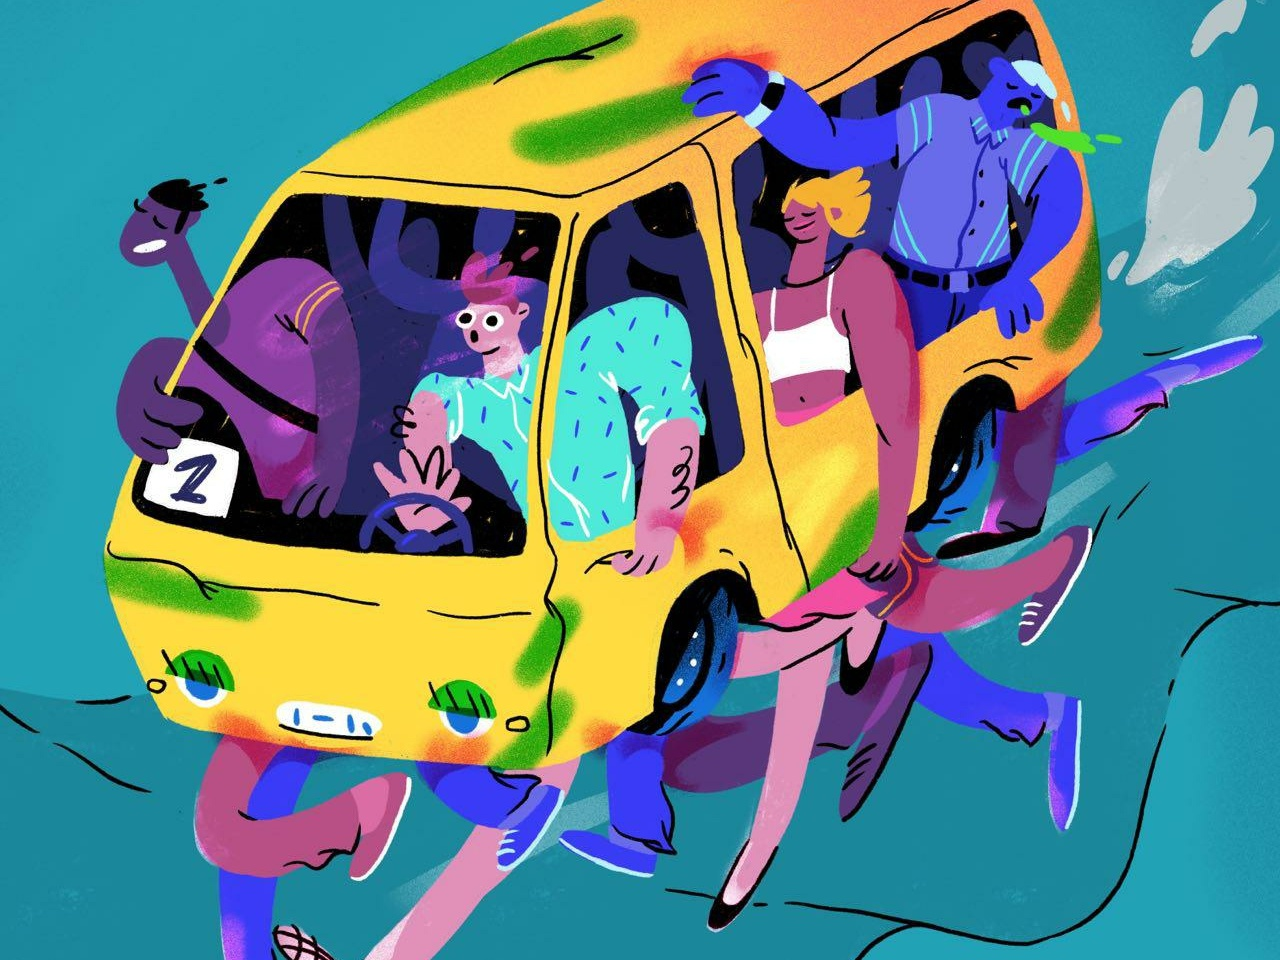 Commute (The Marshrutka) transport city marshrutka challenge urban people nikolaev mykolaiv bus ukraine commute poster illustration everyday art procreate editorial illustration hand drawn doodle design art illustration